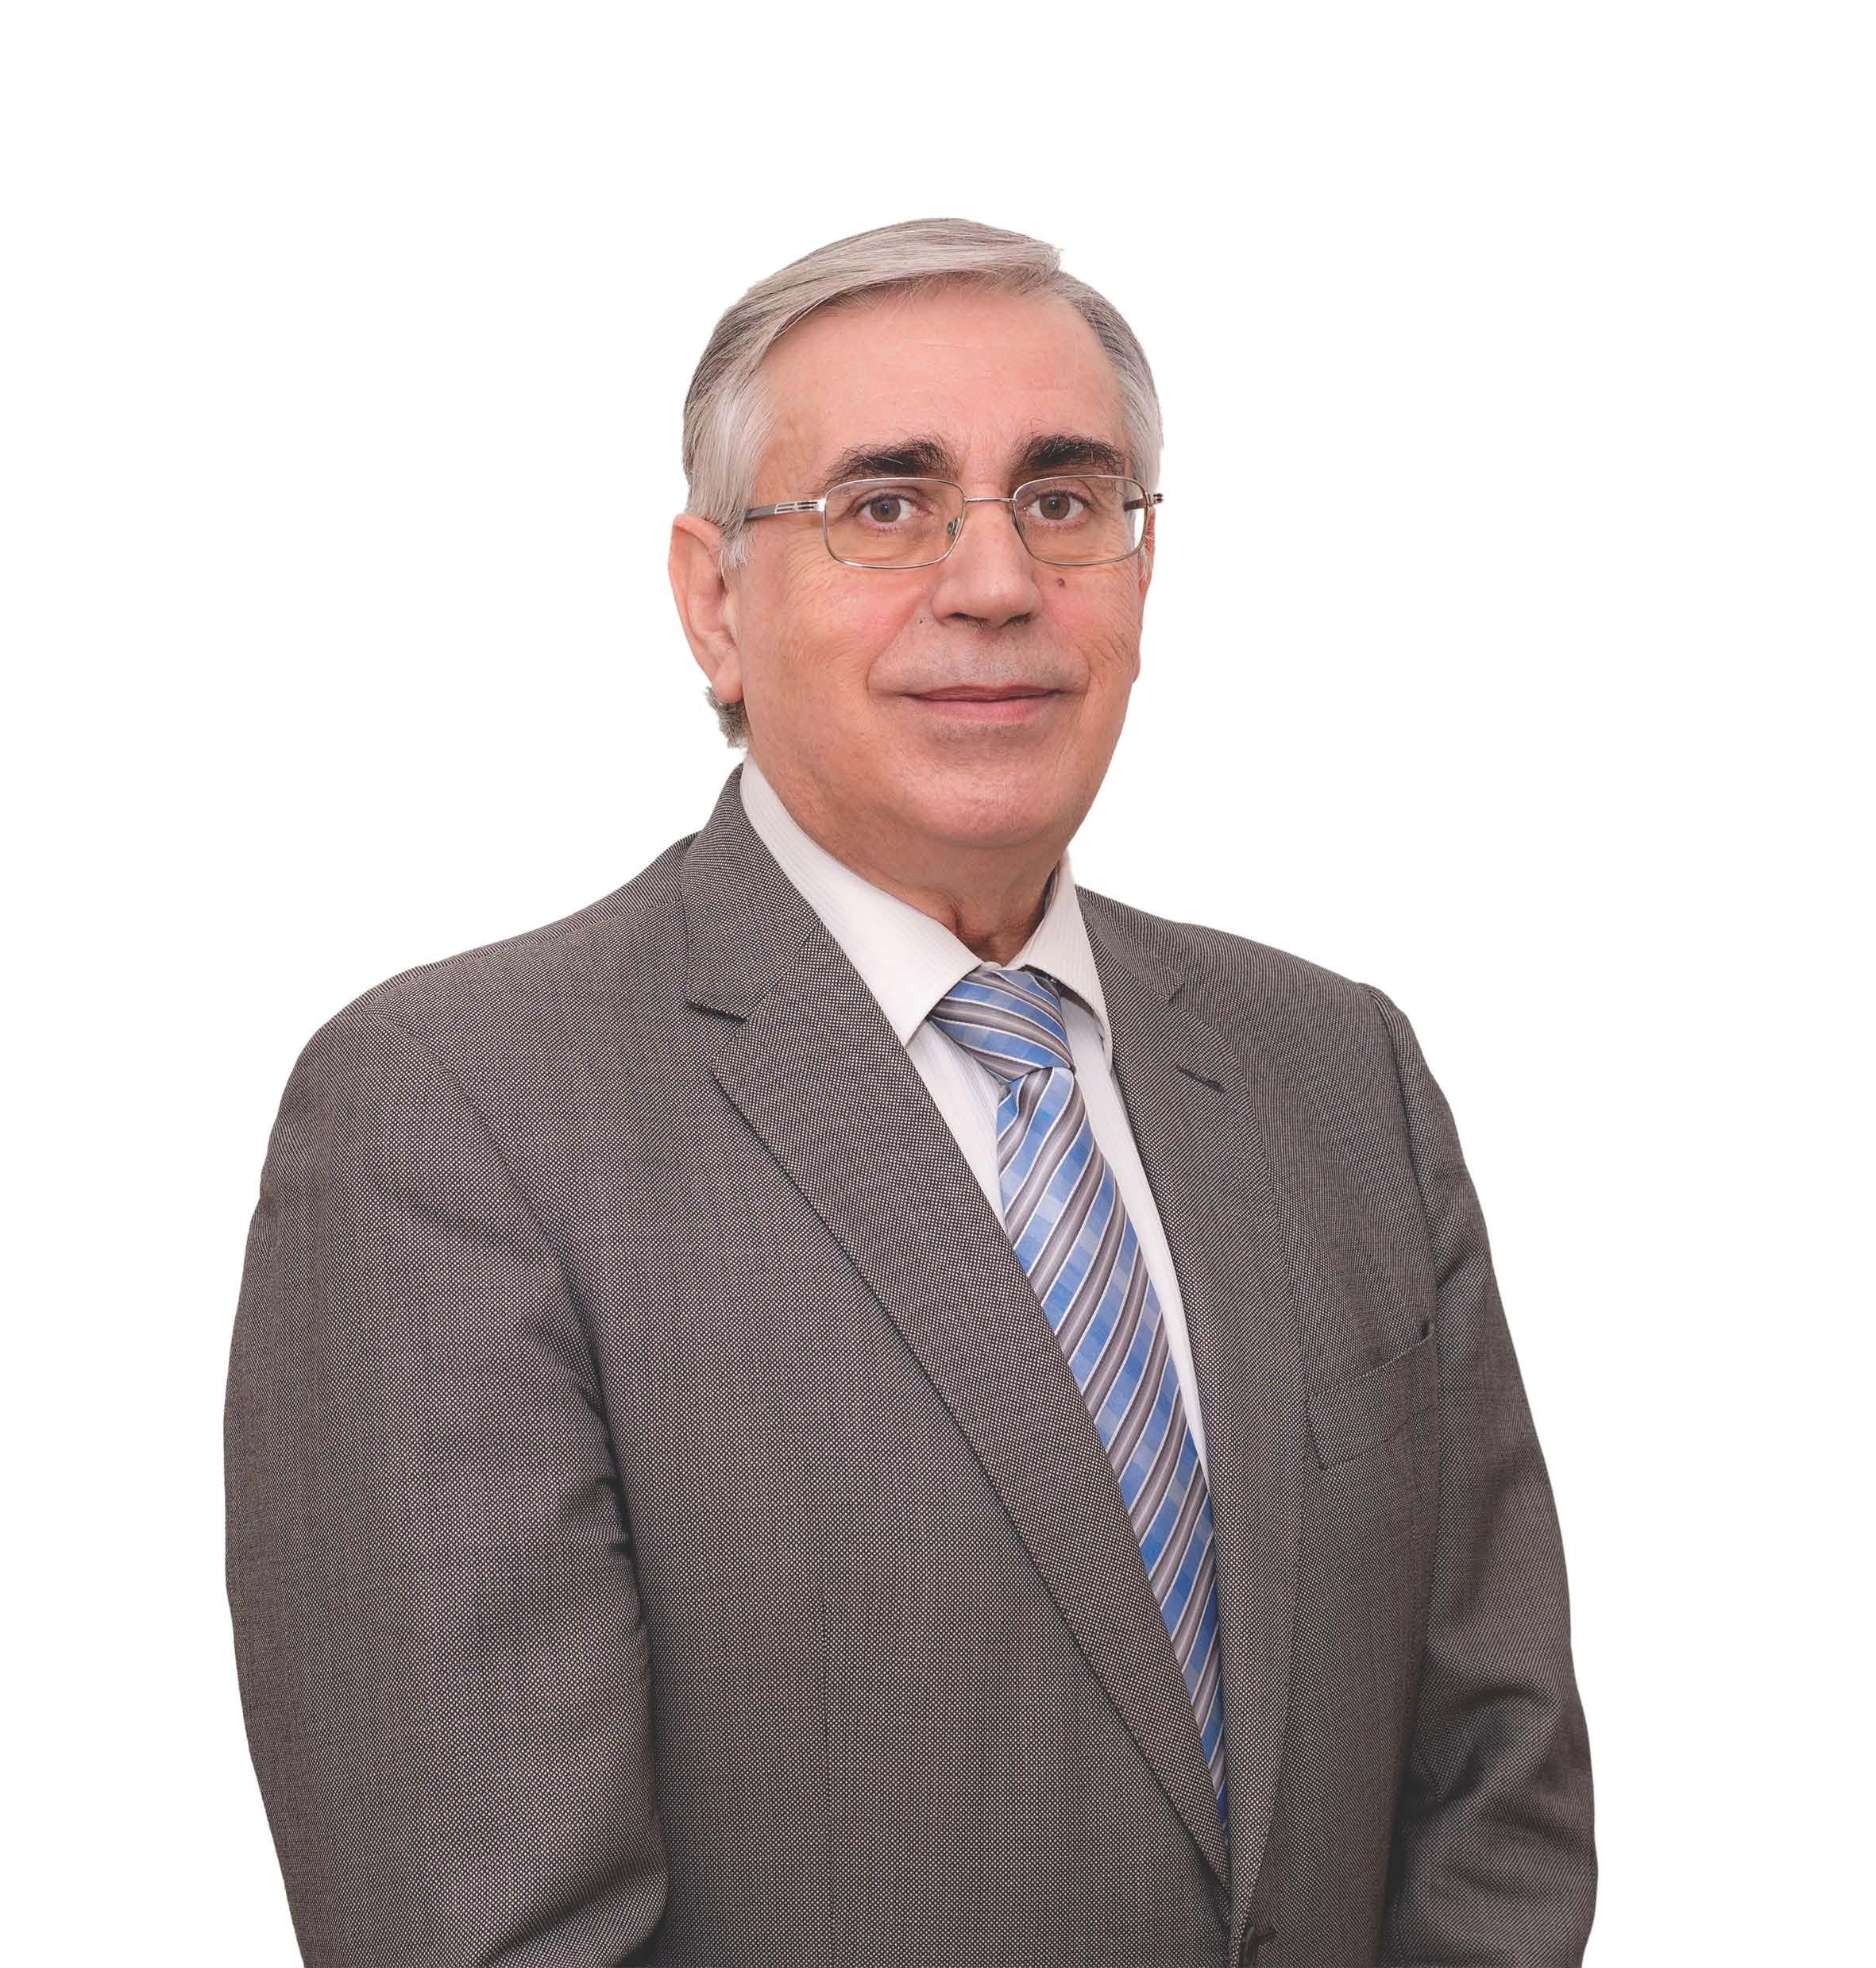 Eduardo Esteban Herranz